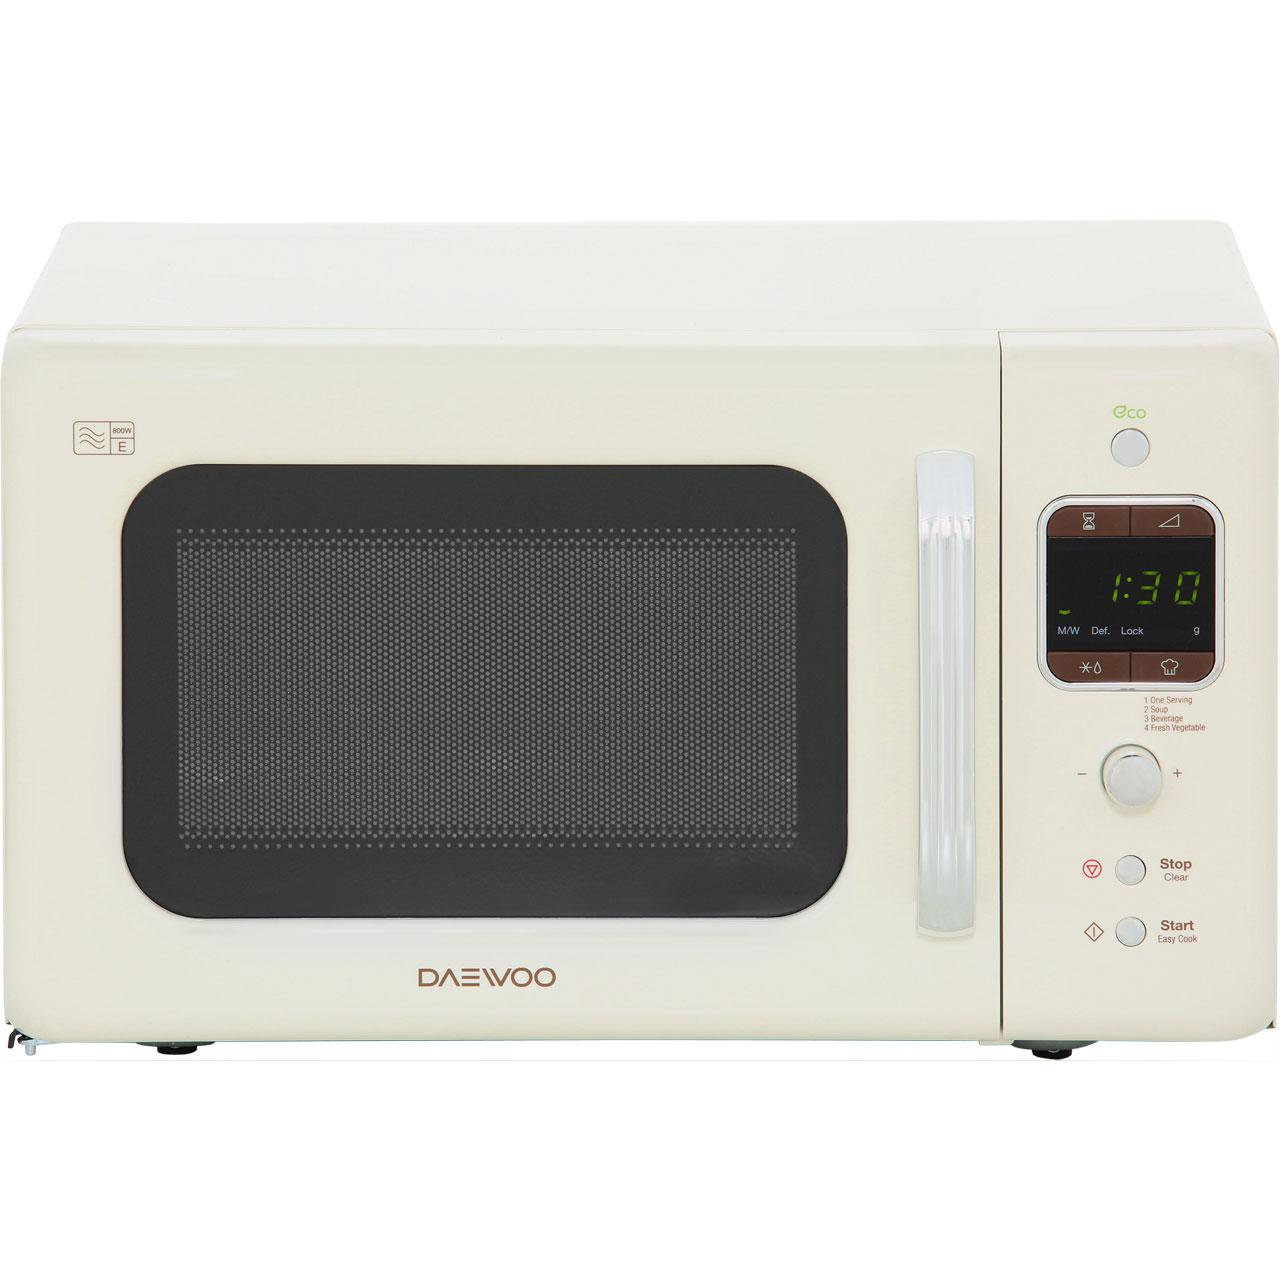 KOR7LBKC_CR   Daewoo Microwave   Cream   20L   ao.com